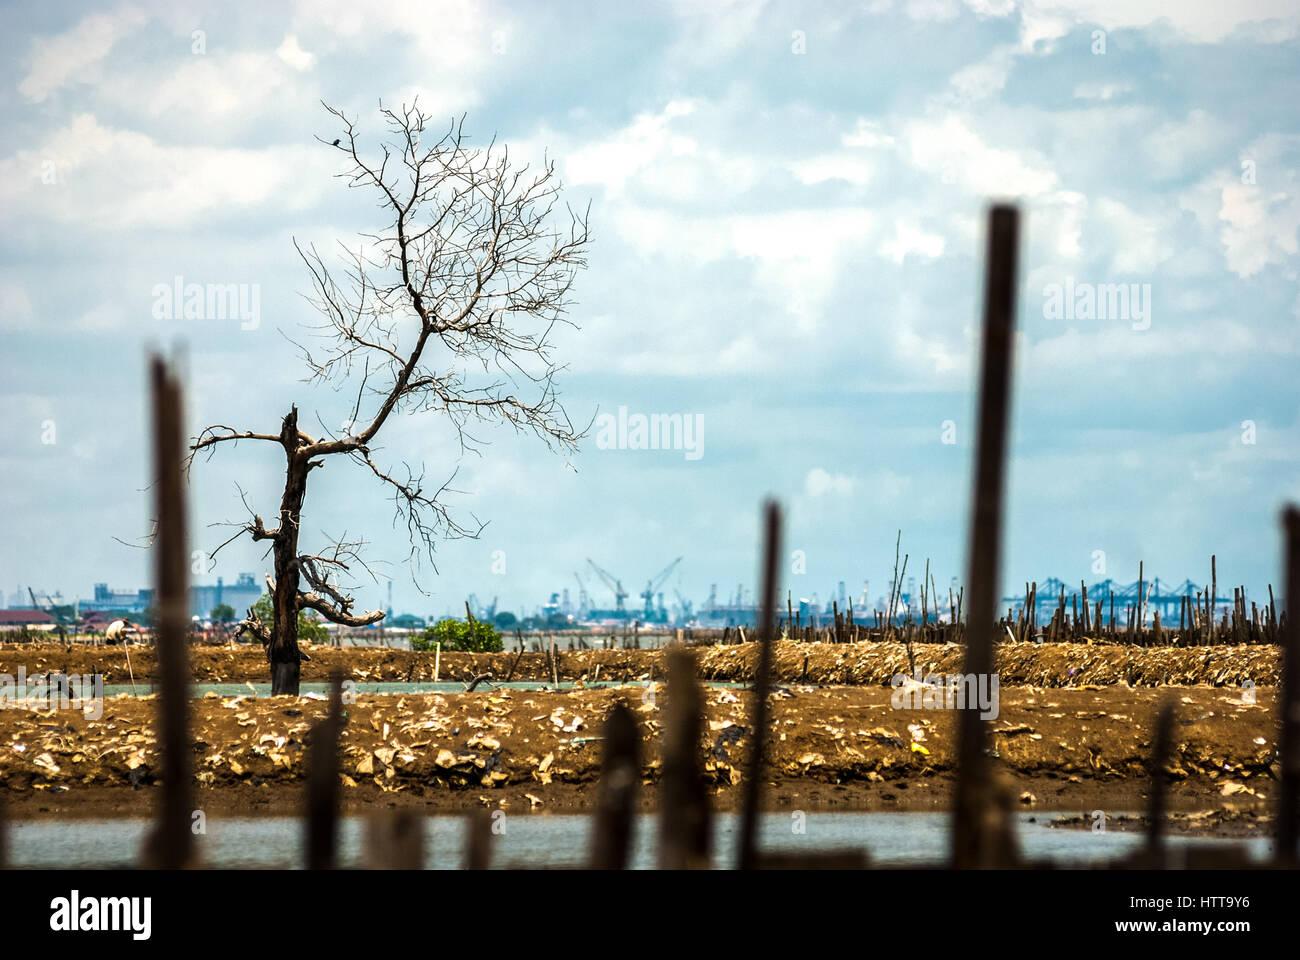 Vue d'un terrains du nord de Jakarta, Indonésie. Reynold © Sumayku Photo Stock